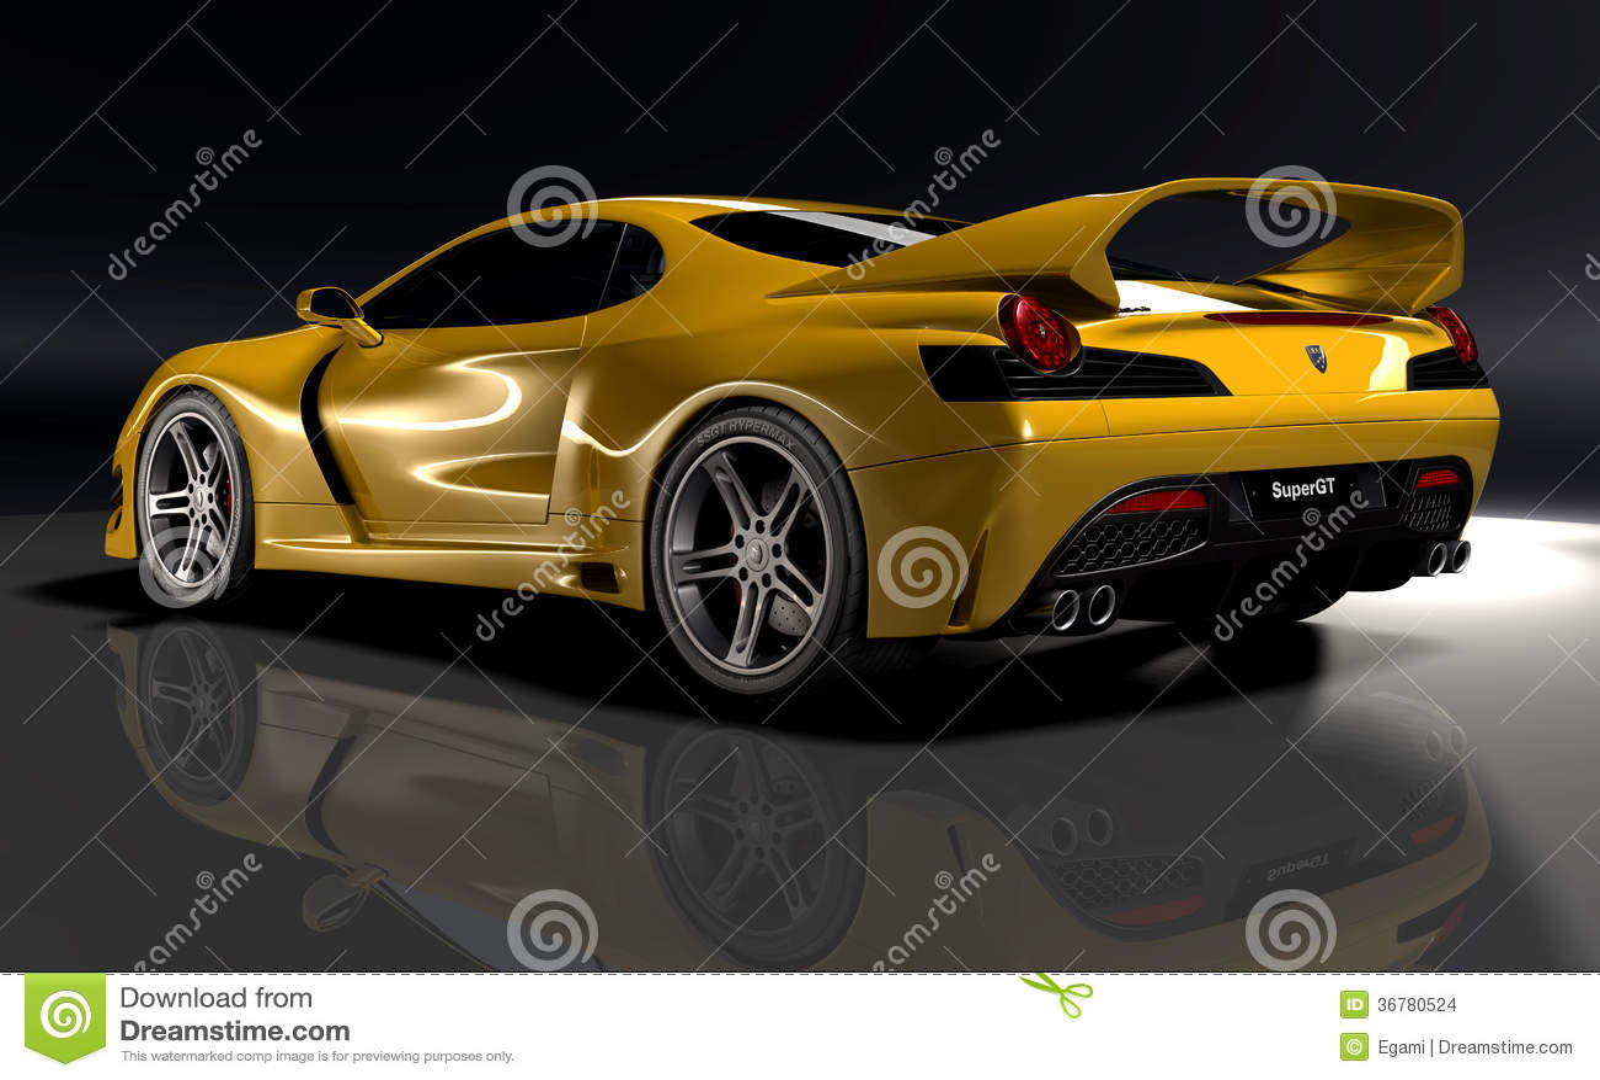 Design my car - Gtvz Car Rear Bumper Design